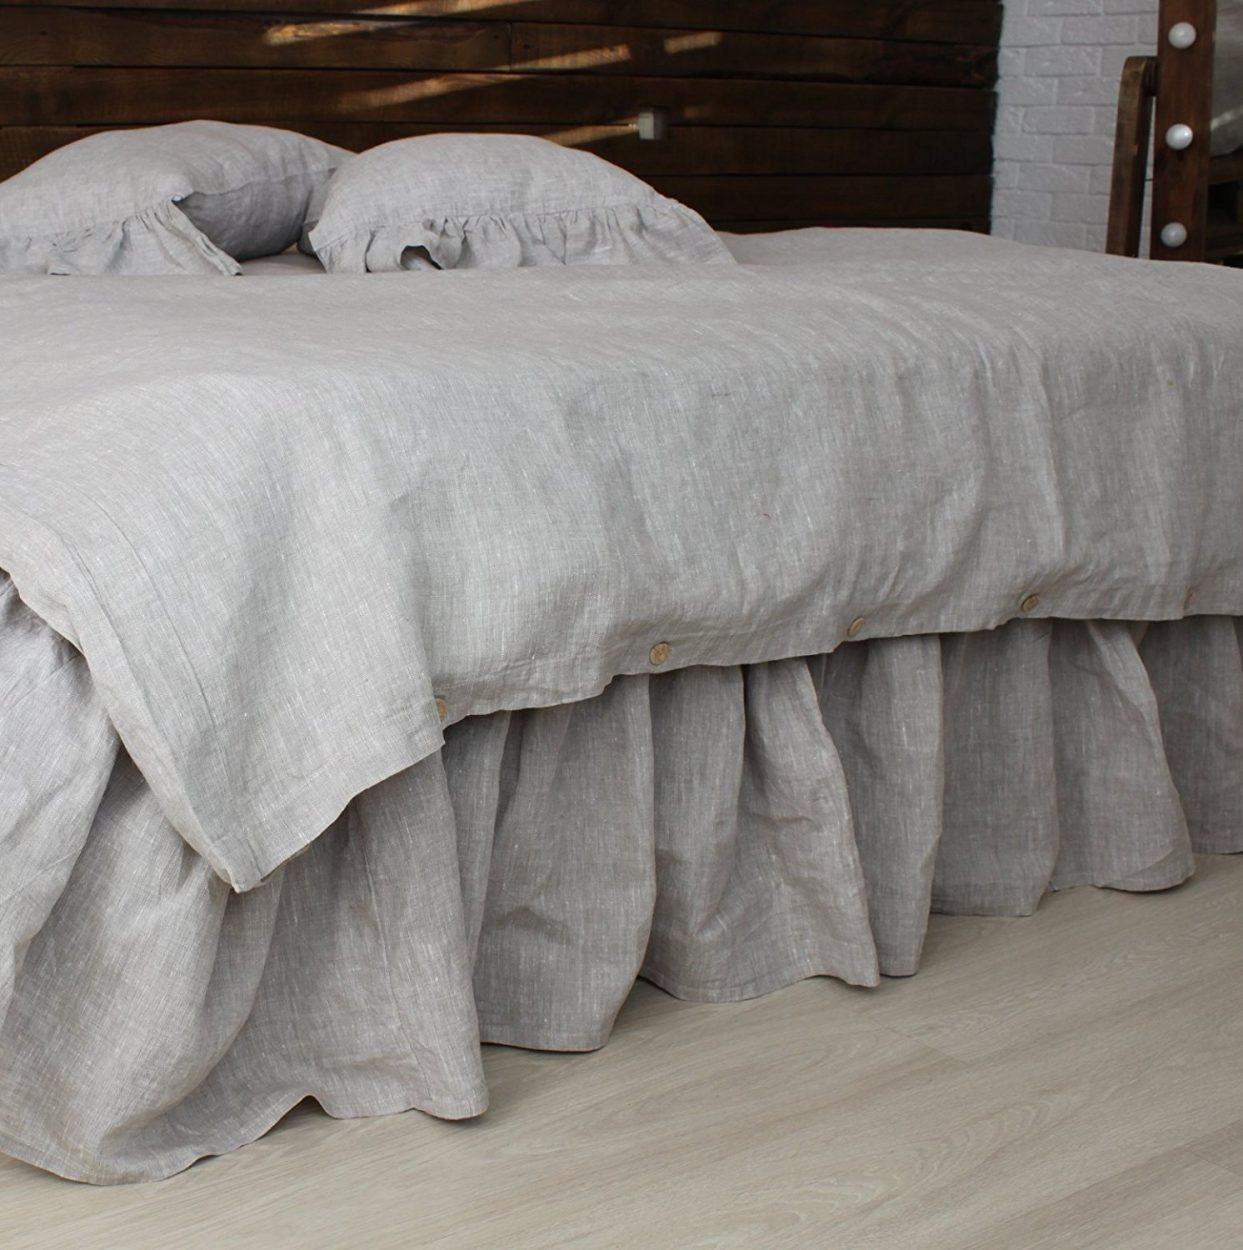 affiliate link - amazon linen bed skirt